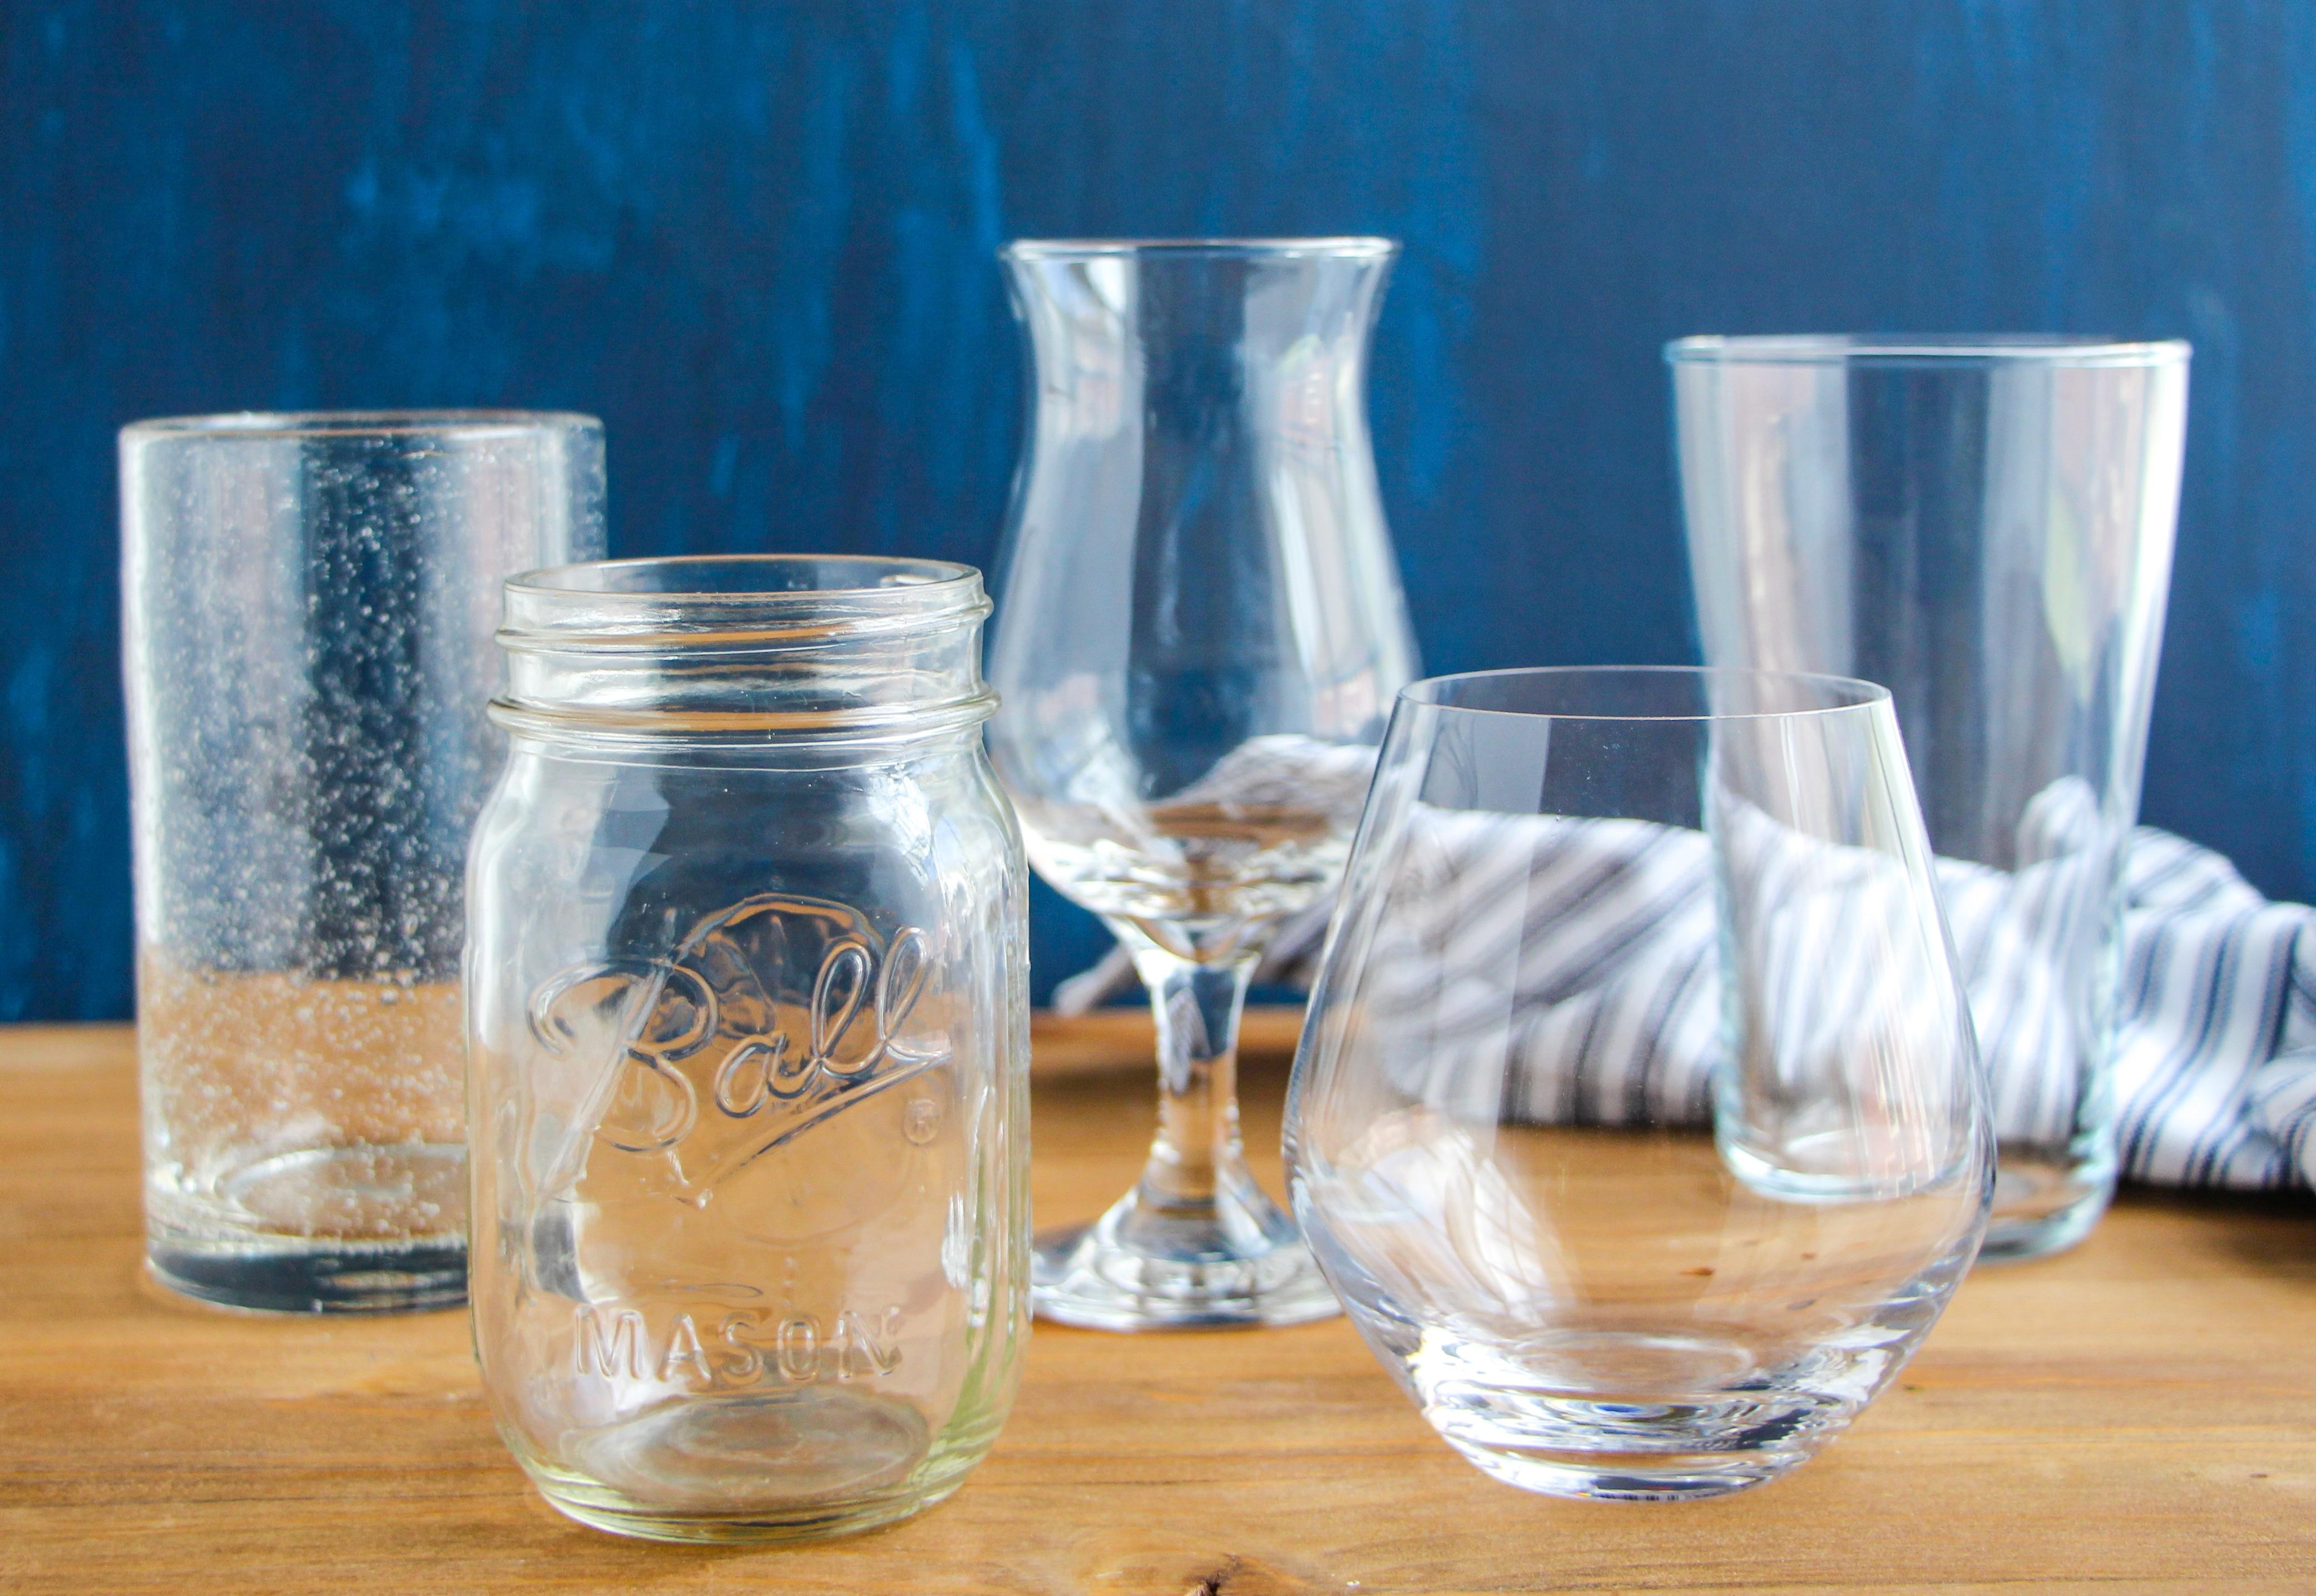 Empty drinking glass, mason jar, cocktail glass, stemless wine glass, rocks glass on a wooden tabletop.